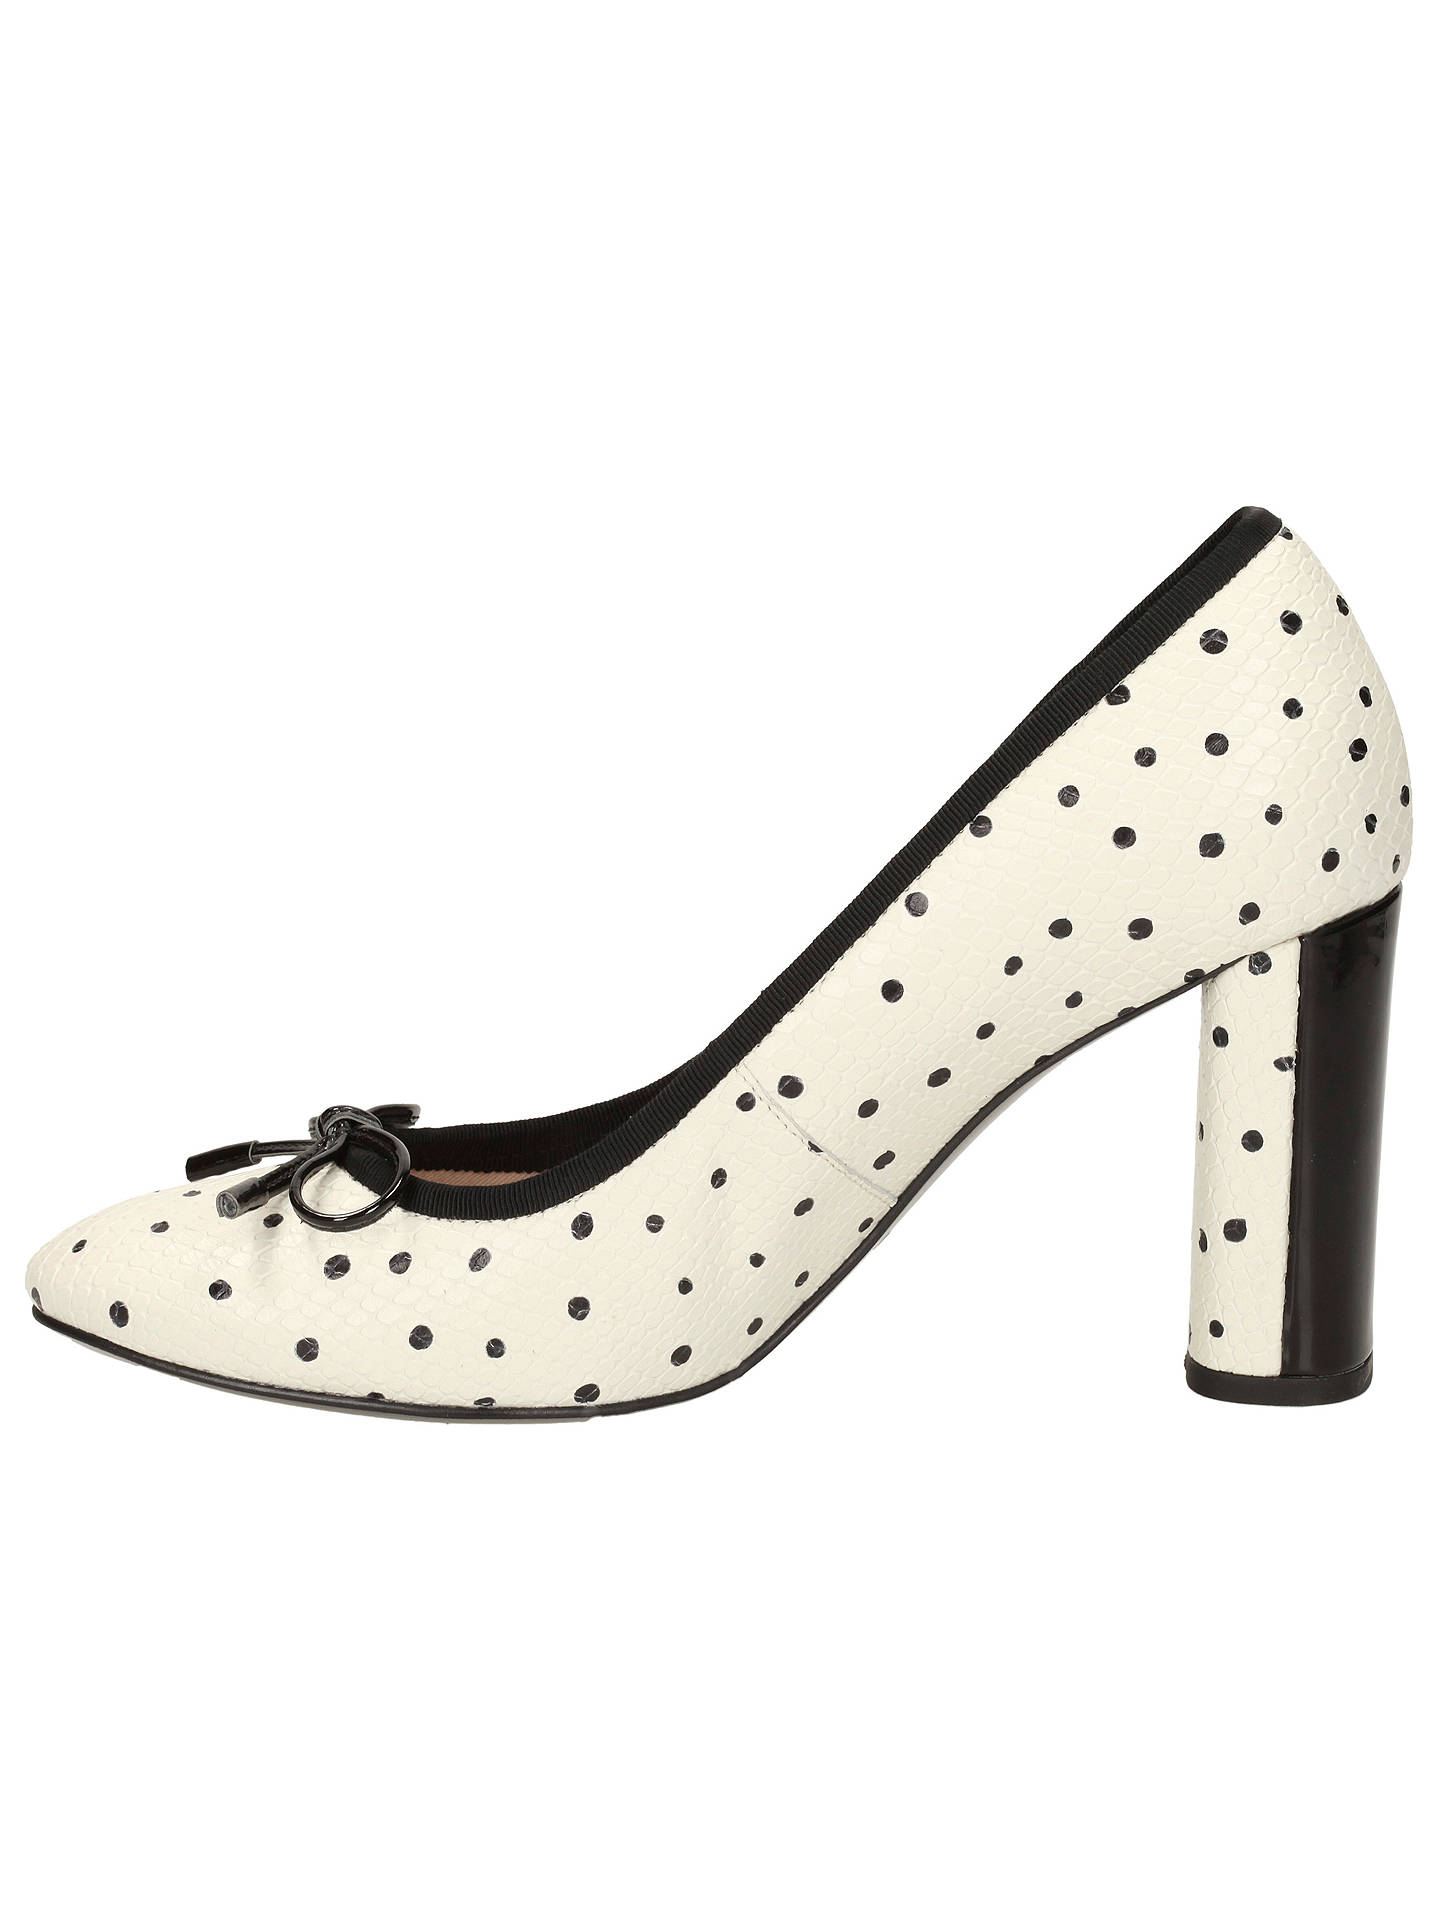 Clarks Idamarie Faye, BlackWhite, Womens Smart Shoes